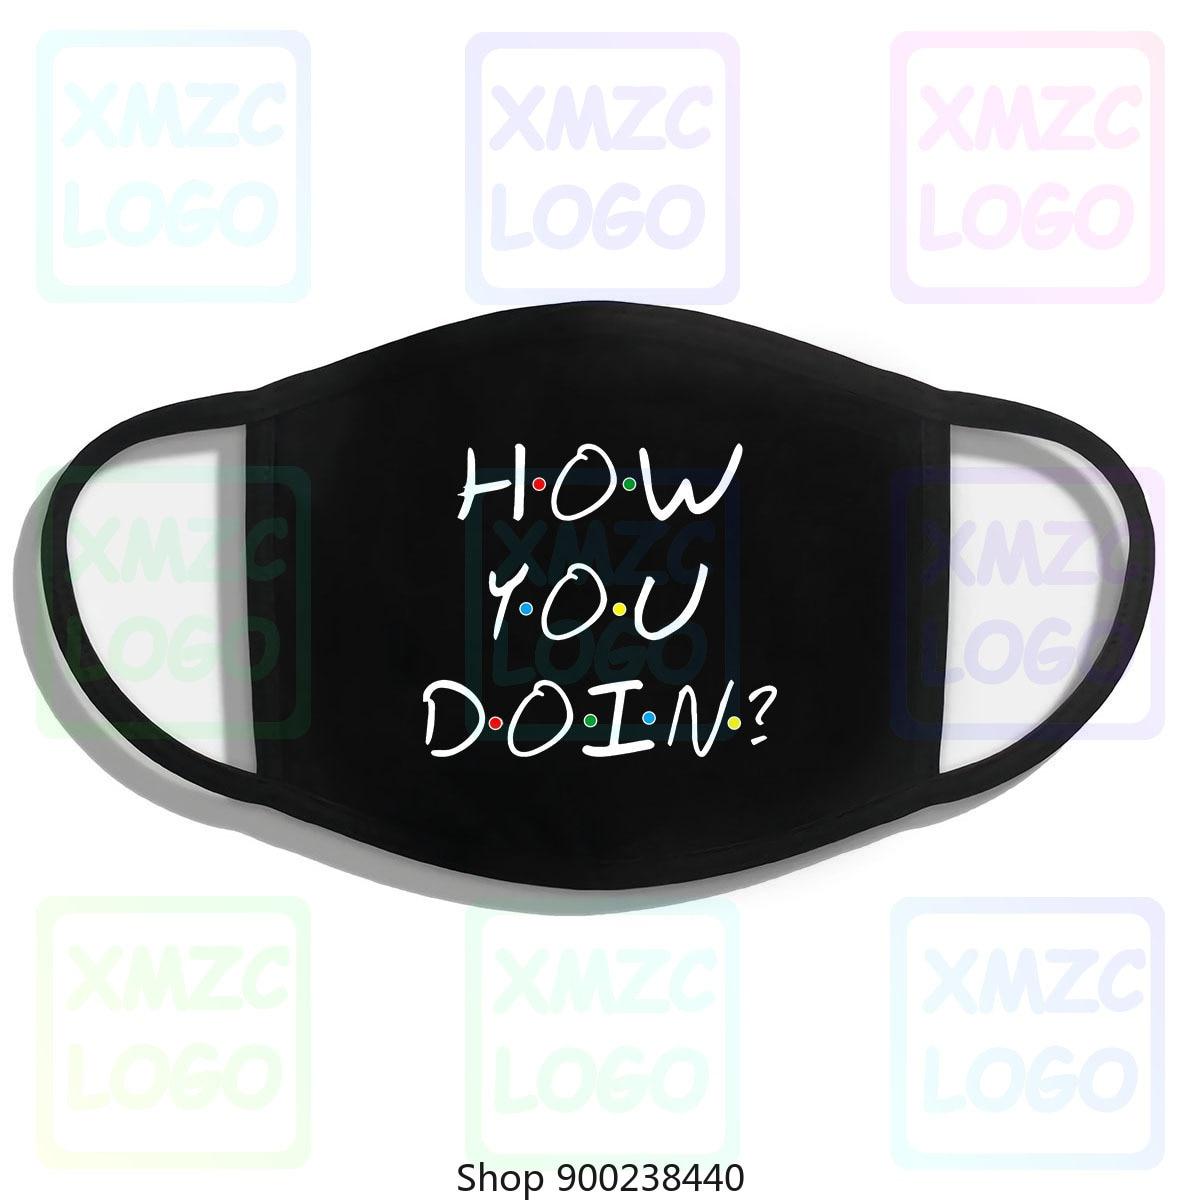 Забавная маска-повязка на голову How You Doin Friends для мужчин и женщин